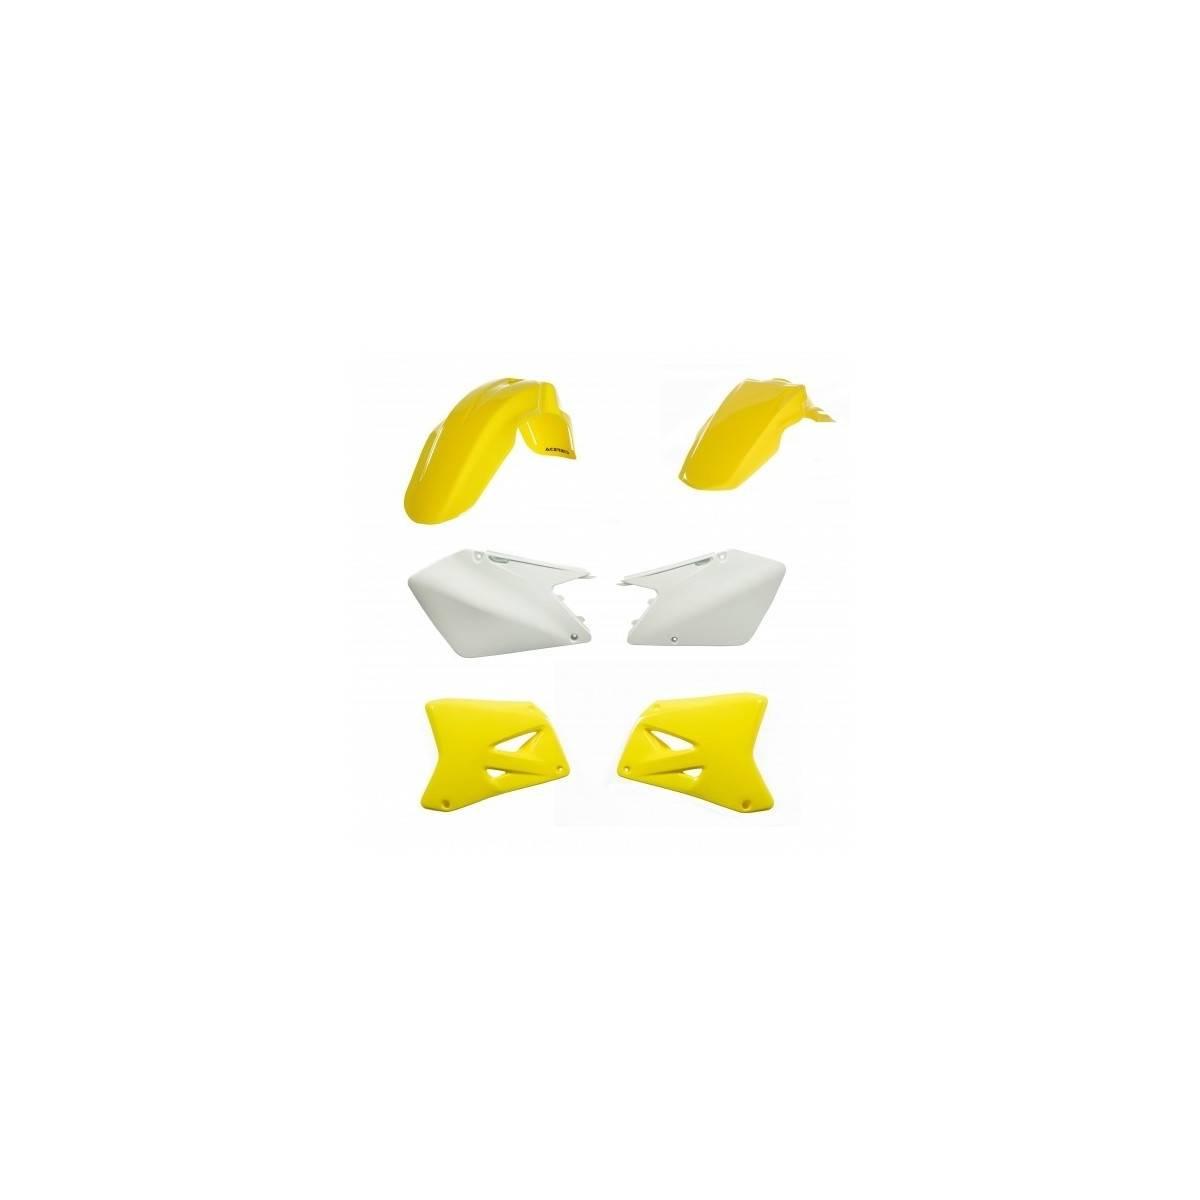 0023080-061 - Kit Plasticos Yzf 250 18 Amarillo Fluor